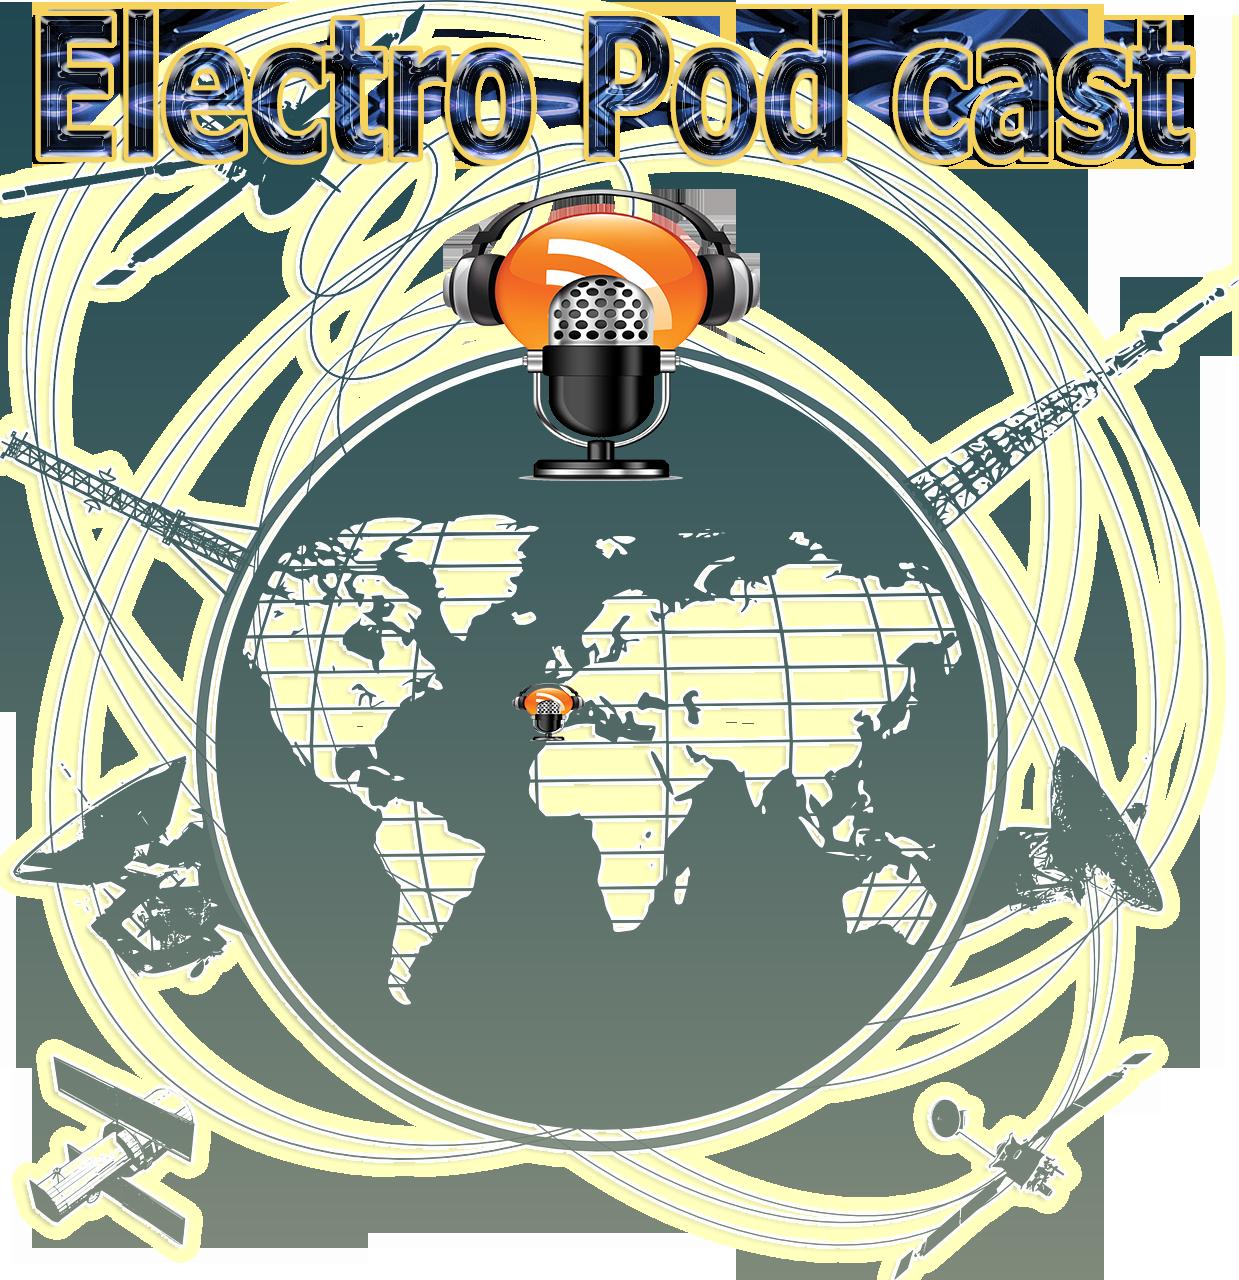 Electro Pod Cast